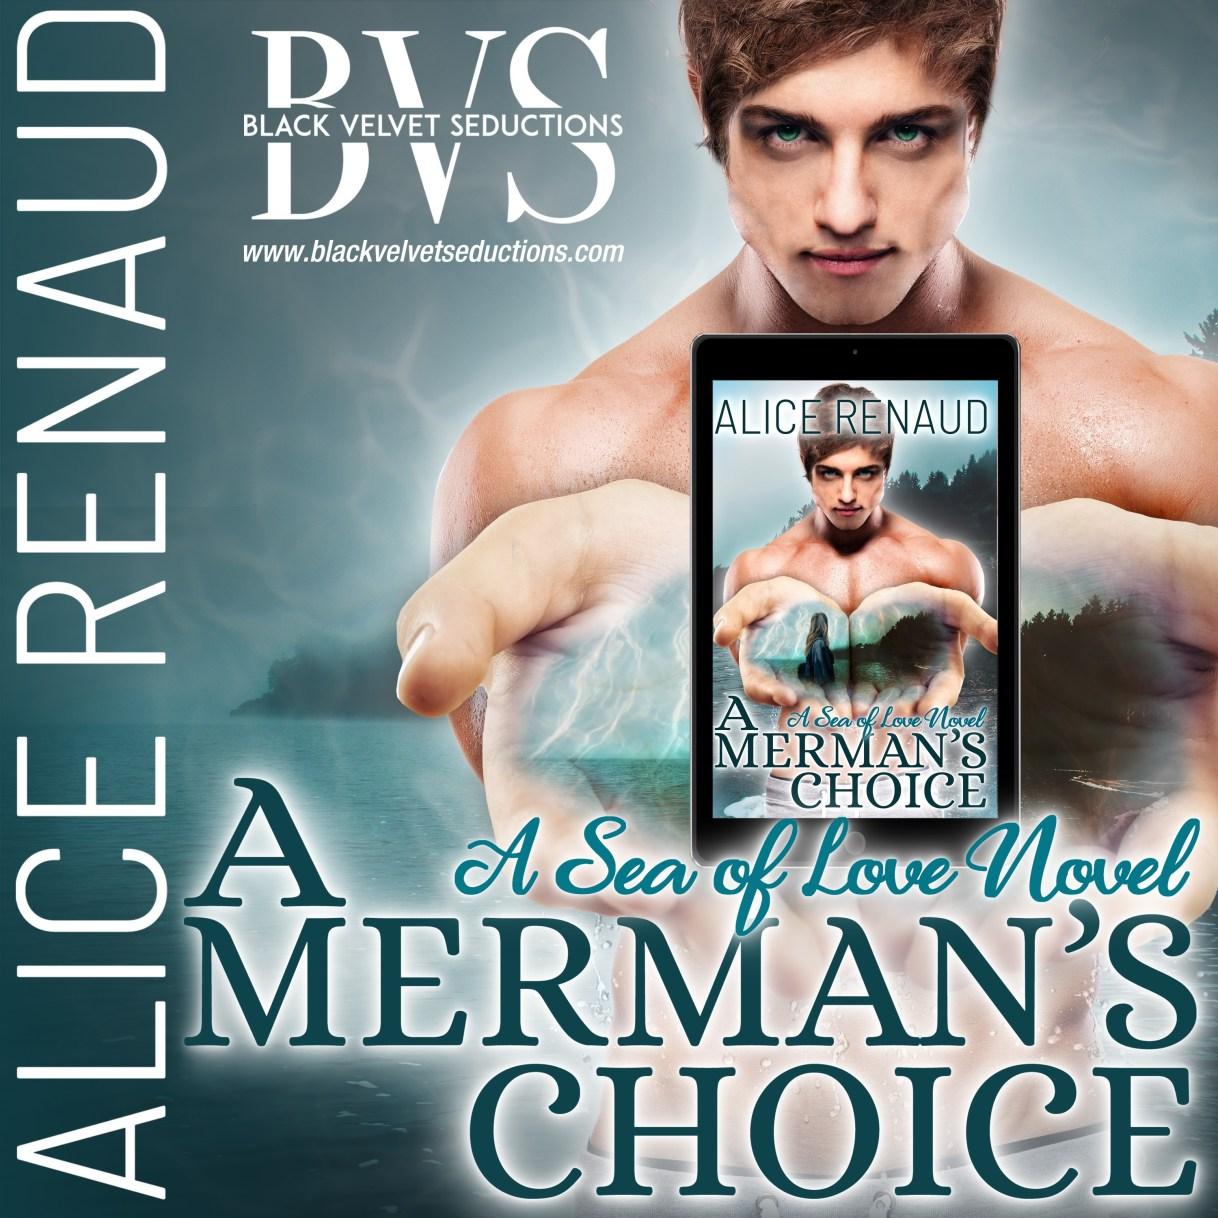 mermans choice insta.jpg